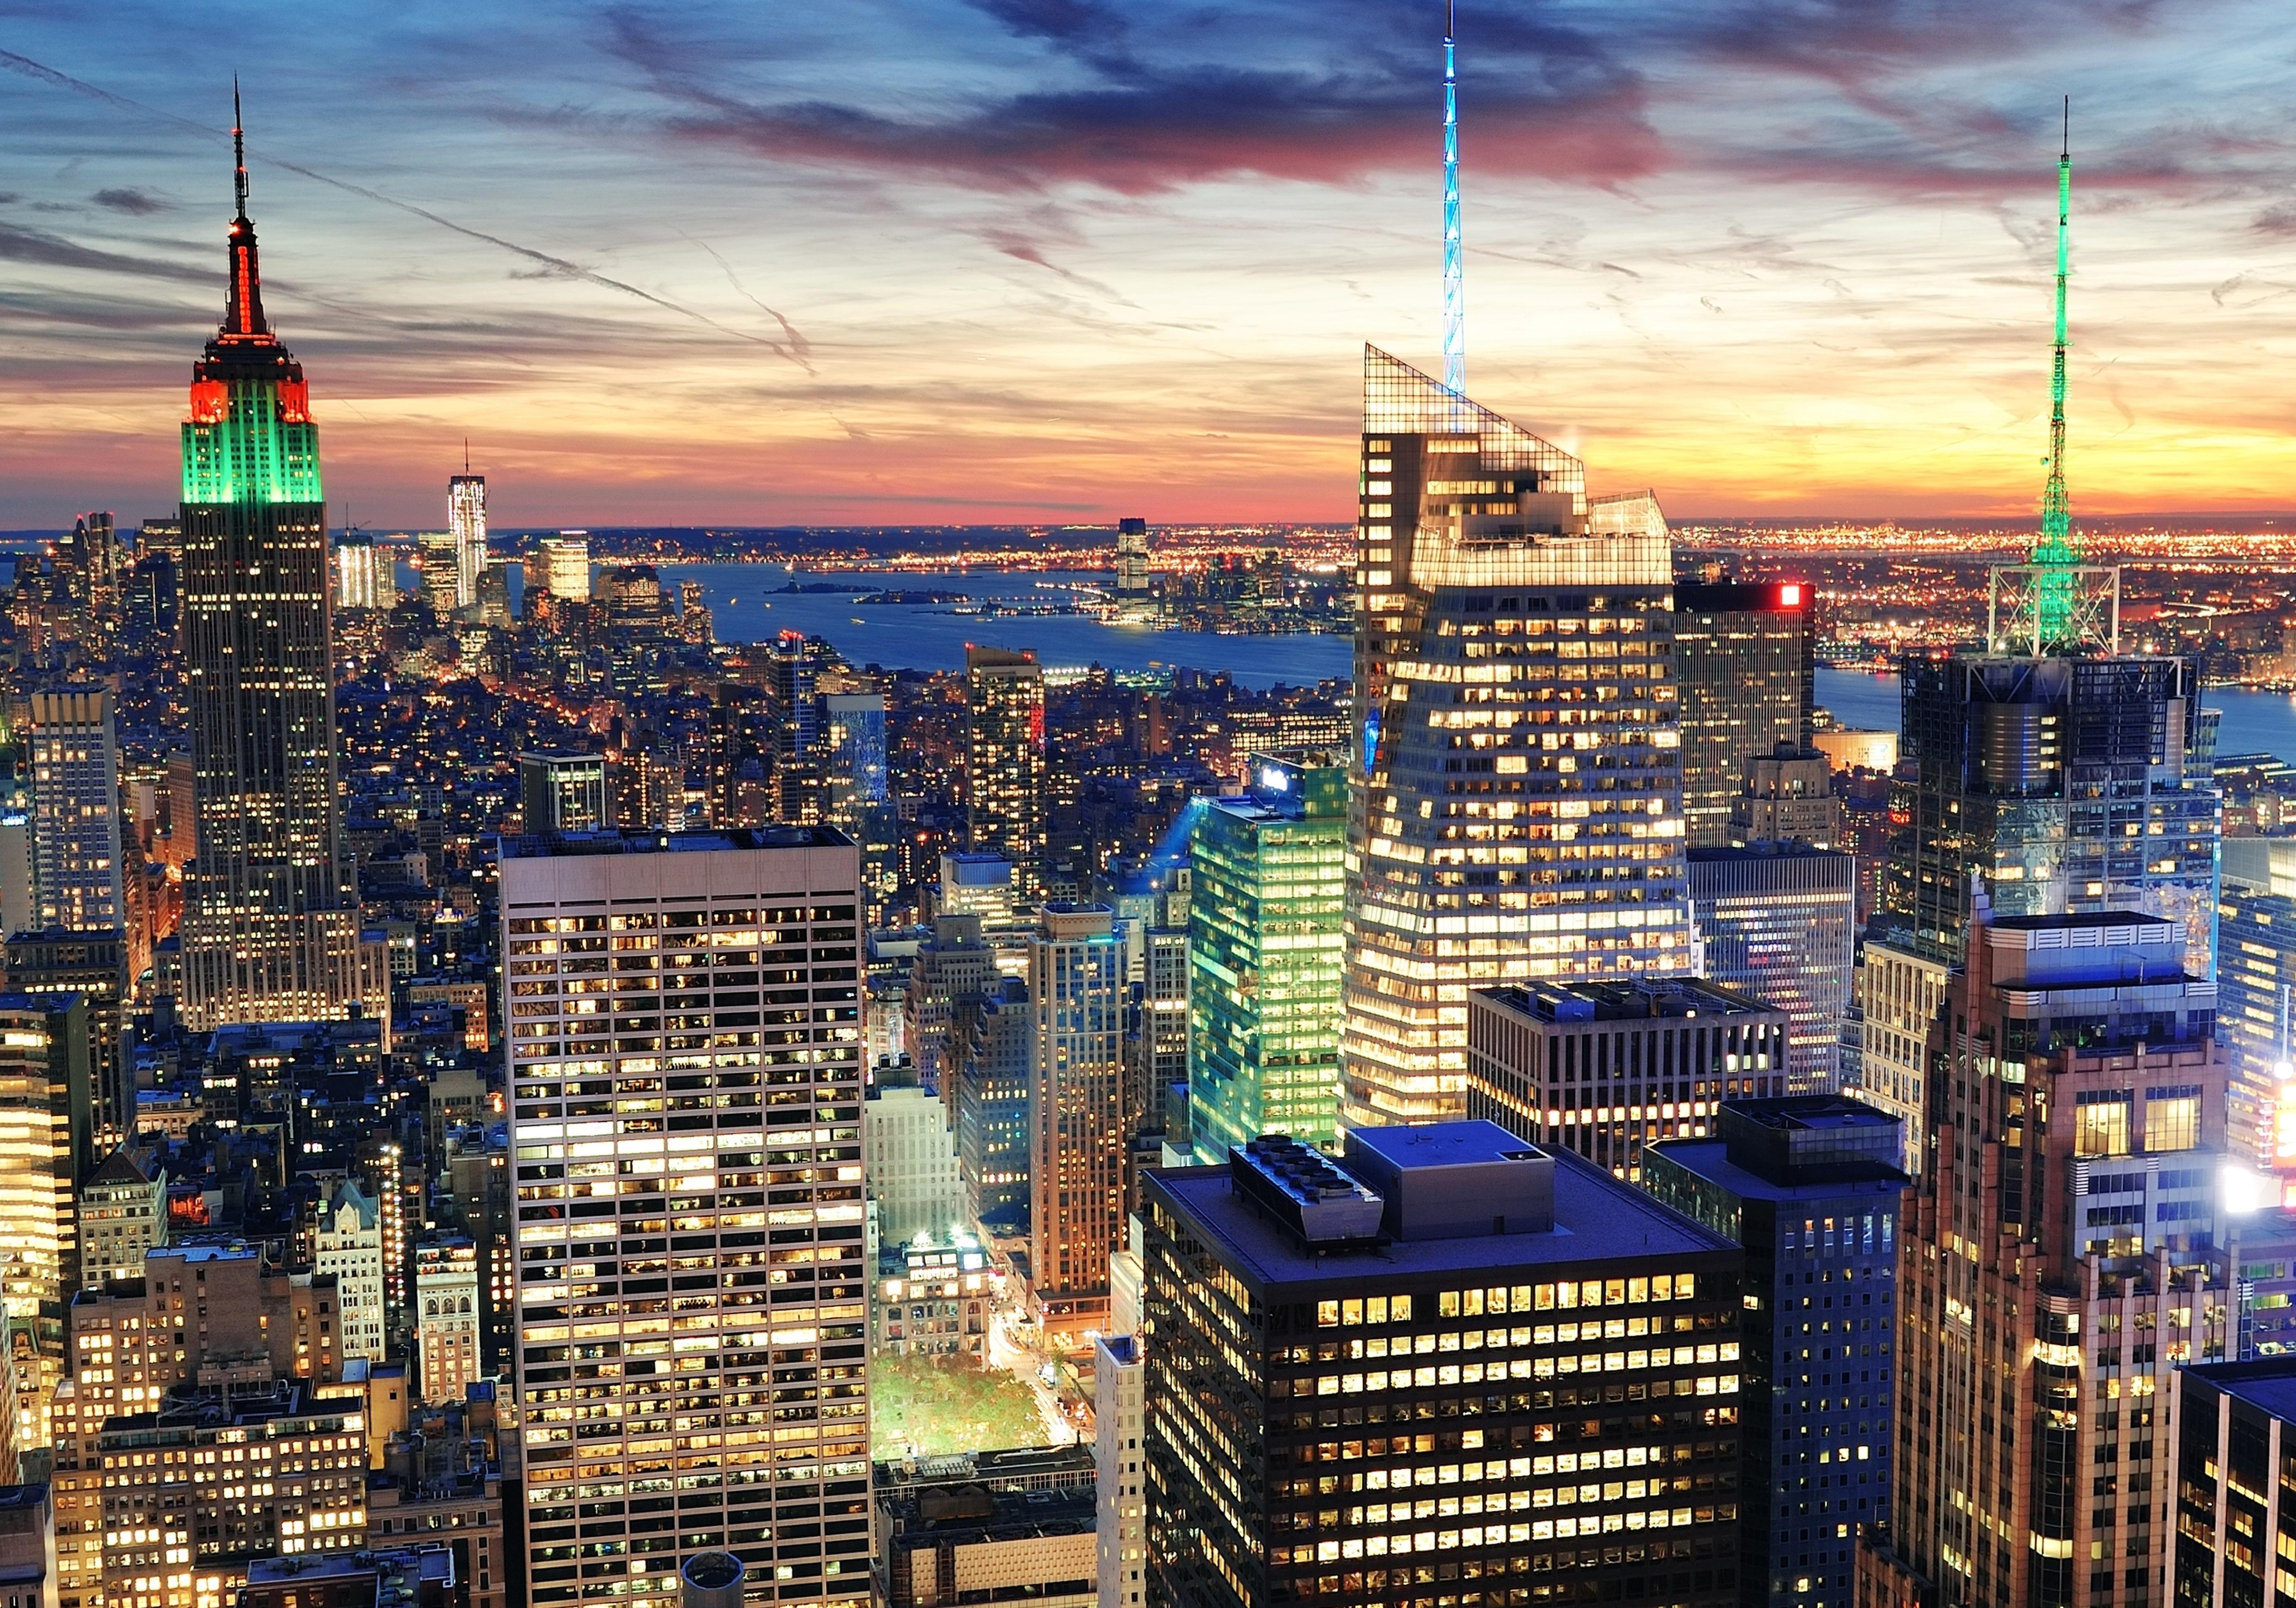 Download New York City Nyc Usa 960x544 Resolution HD 4K Wallpaper